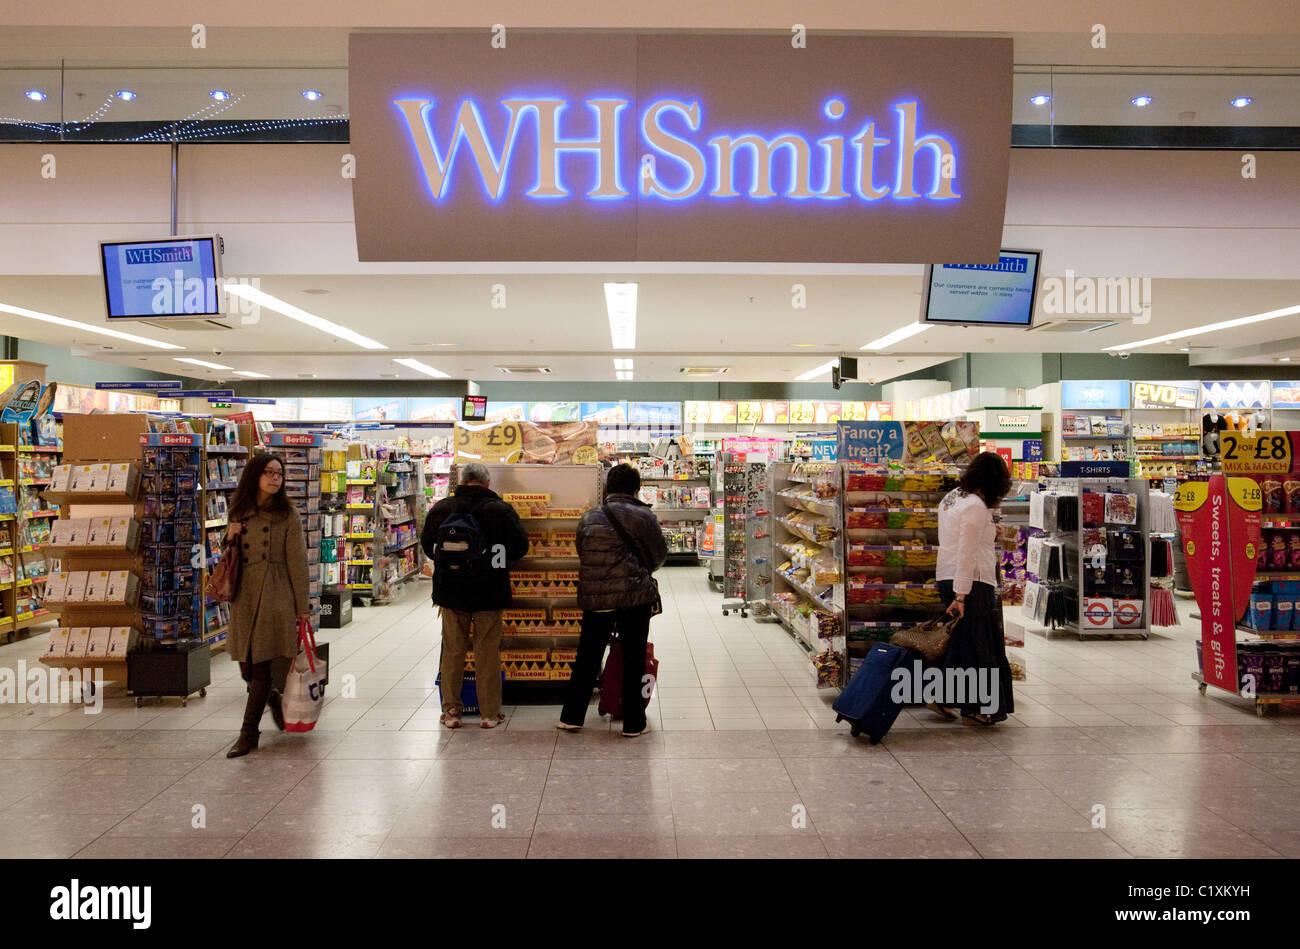 W H Smiths store, terminal 5, heathrow airport London UK - Stock Image